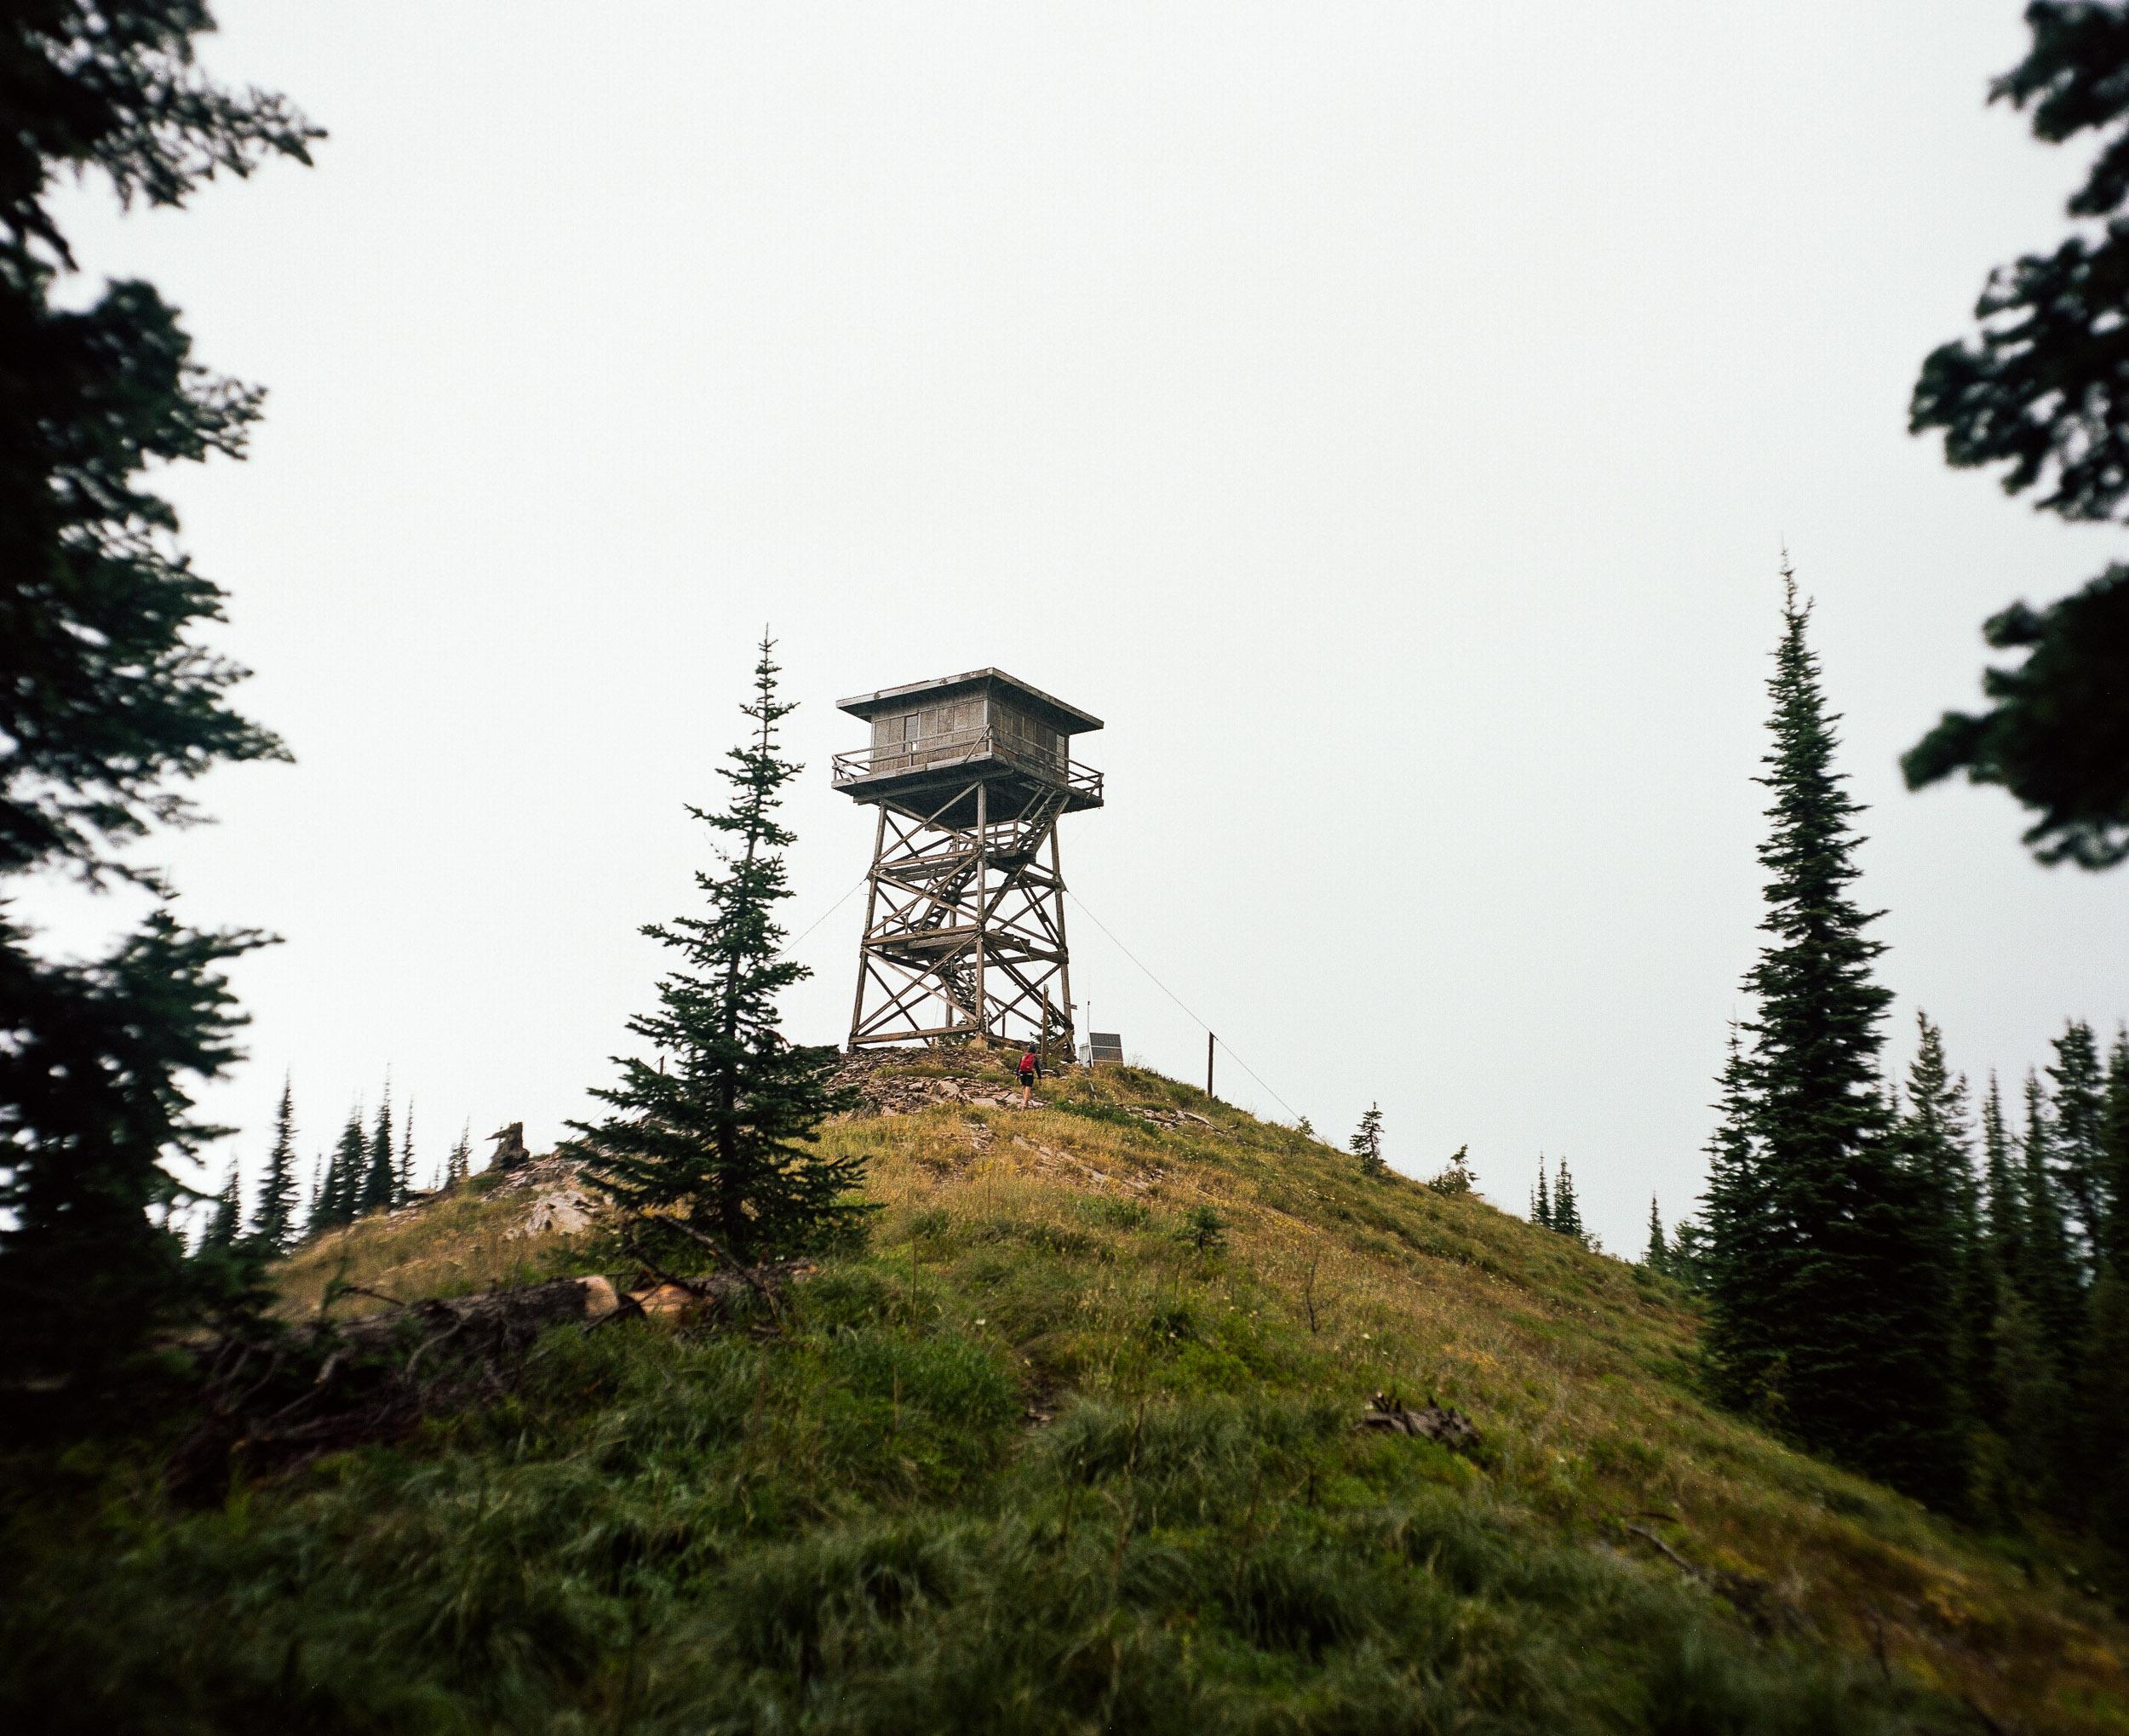 Firewatch tower on a hilltop Libby, Montana